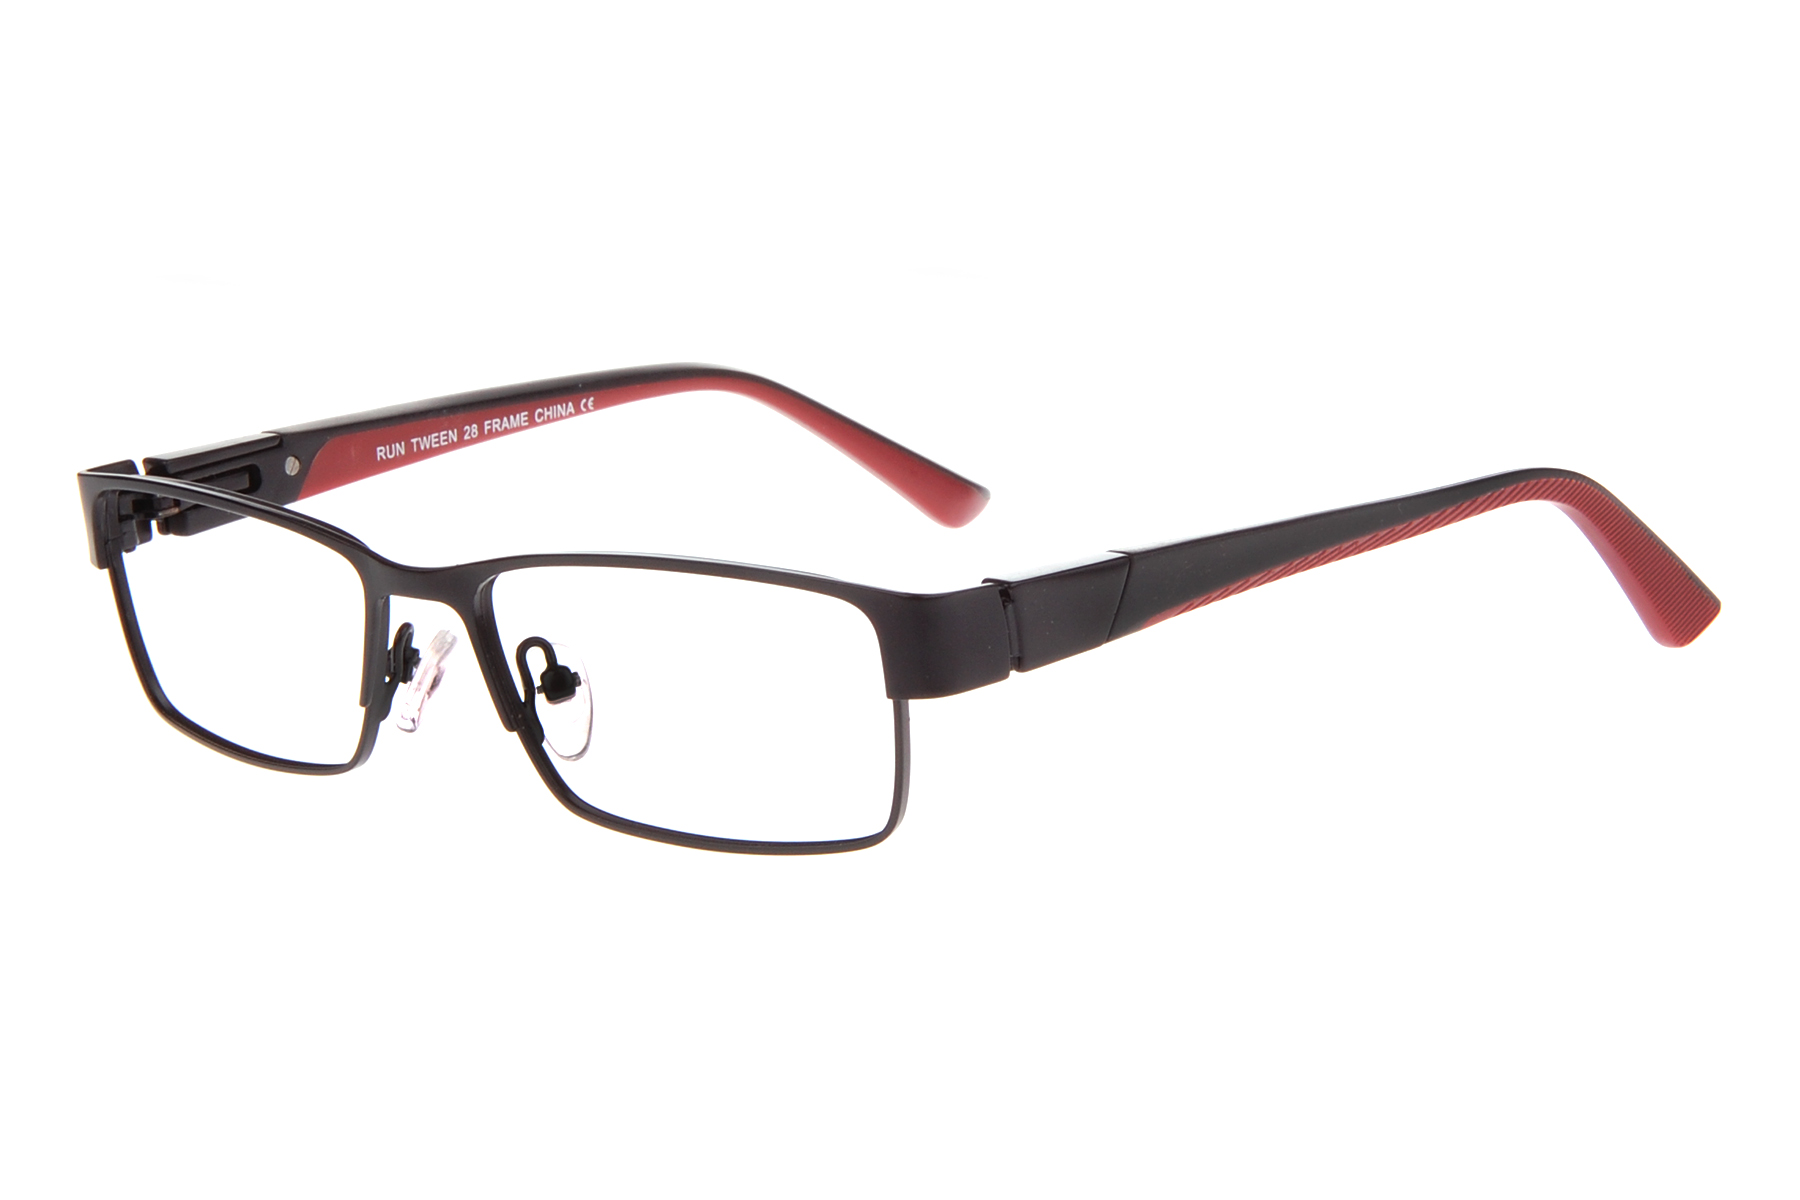 a3f5038d377f SunOptique.com   Runway Tween Eyeglasses Tween 37